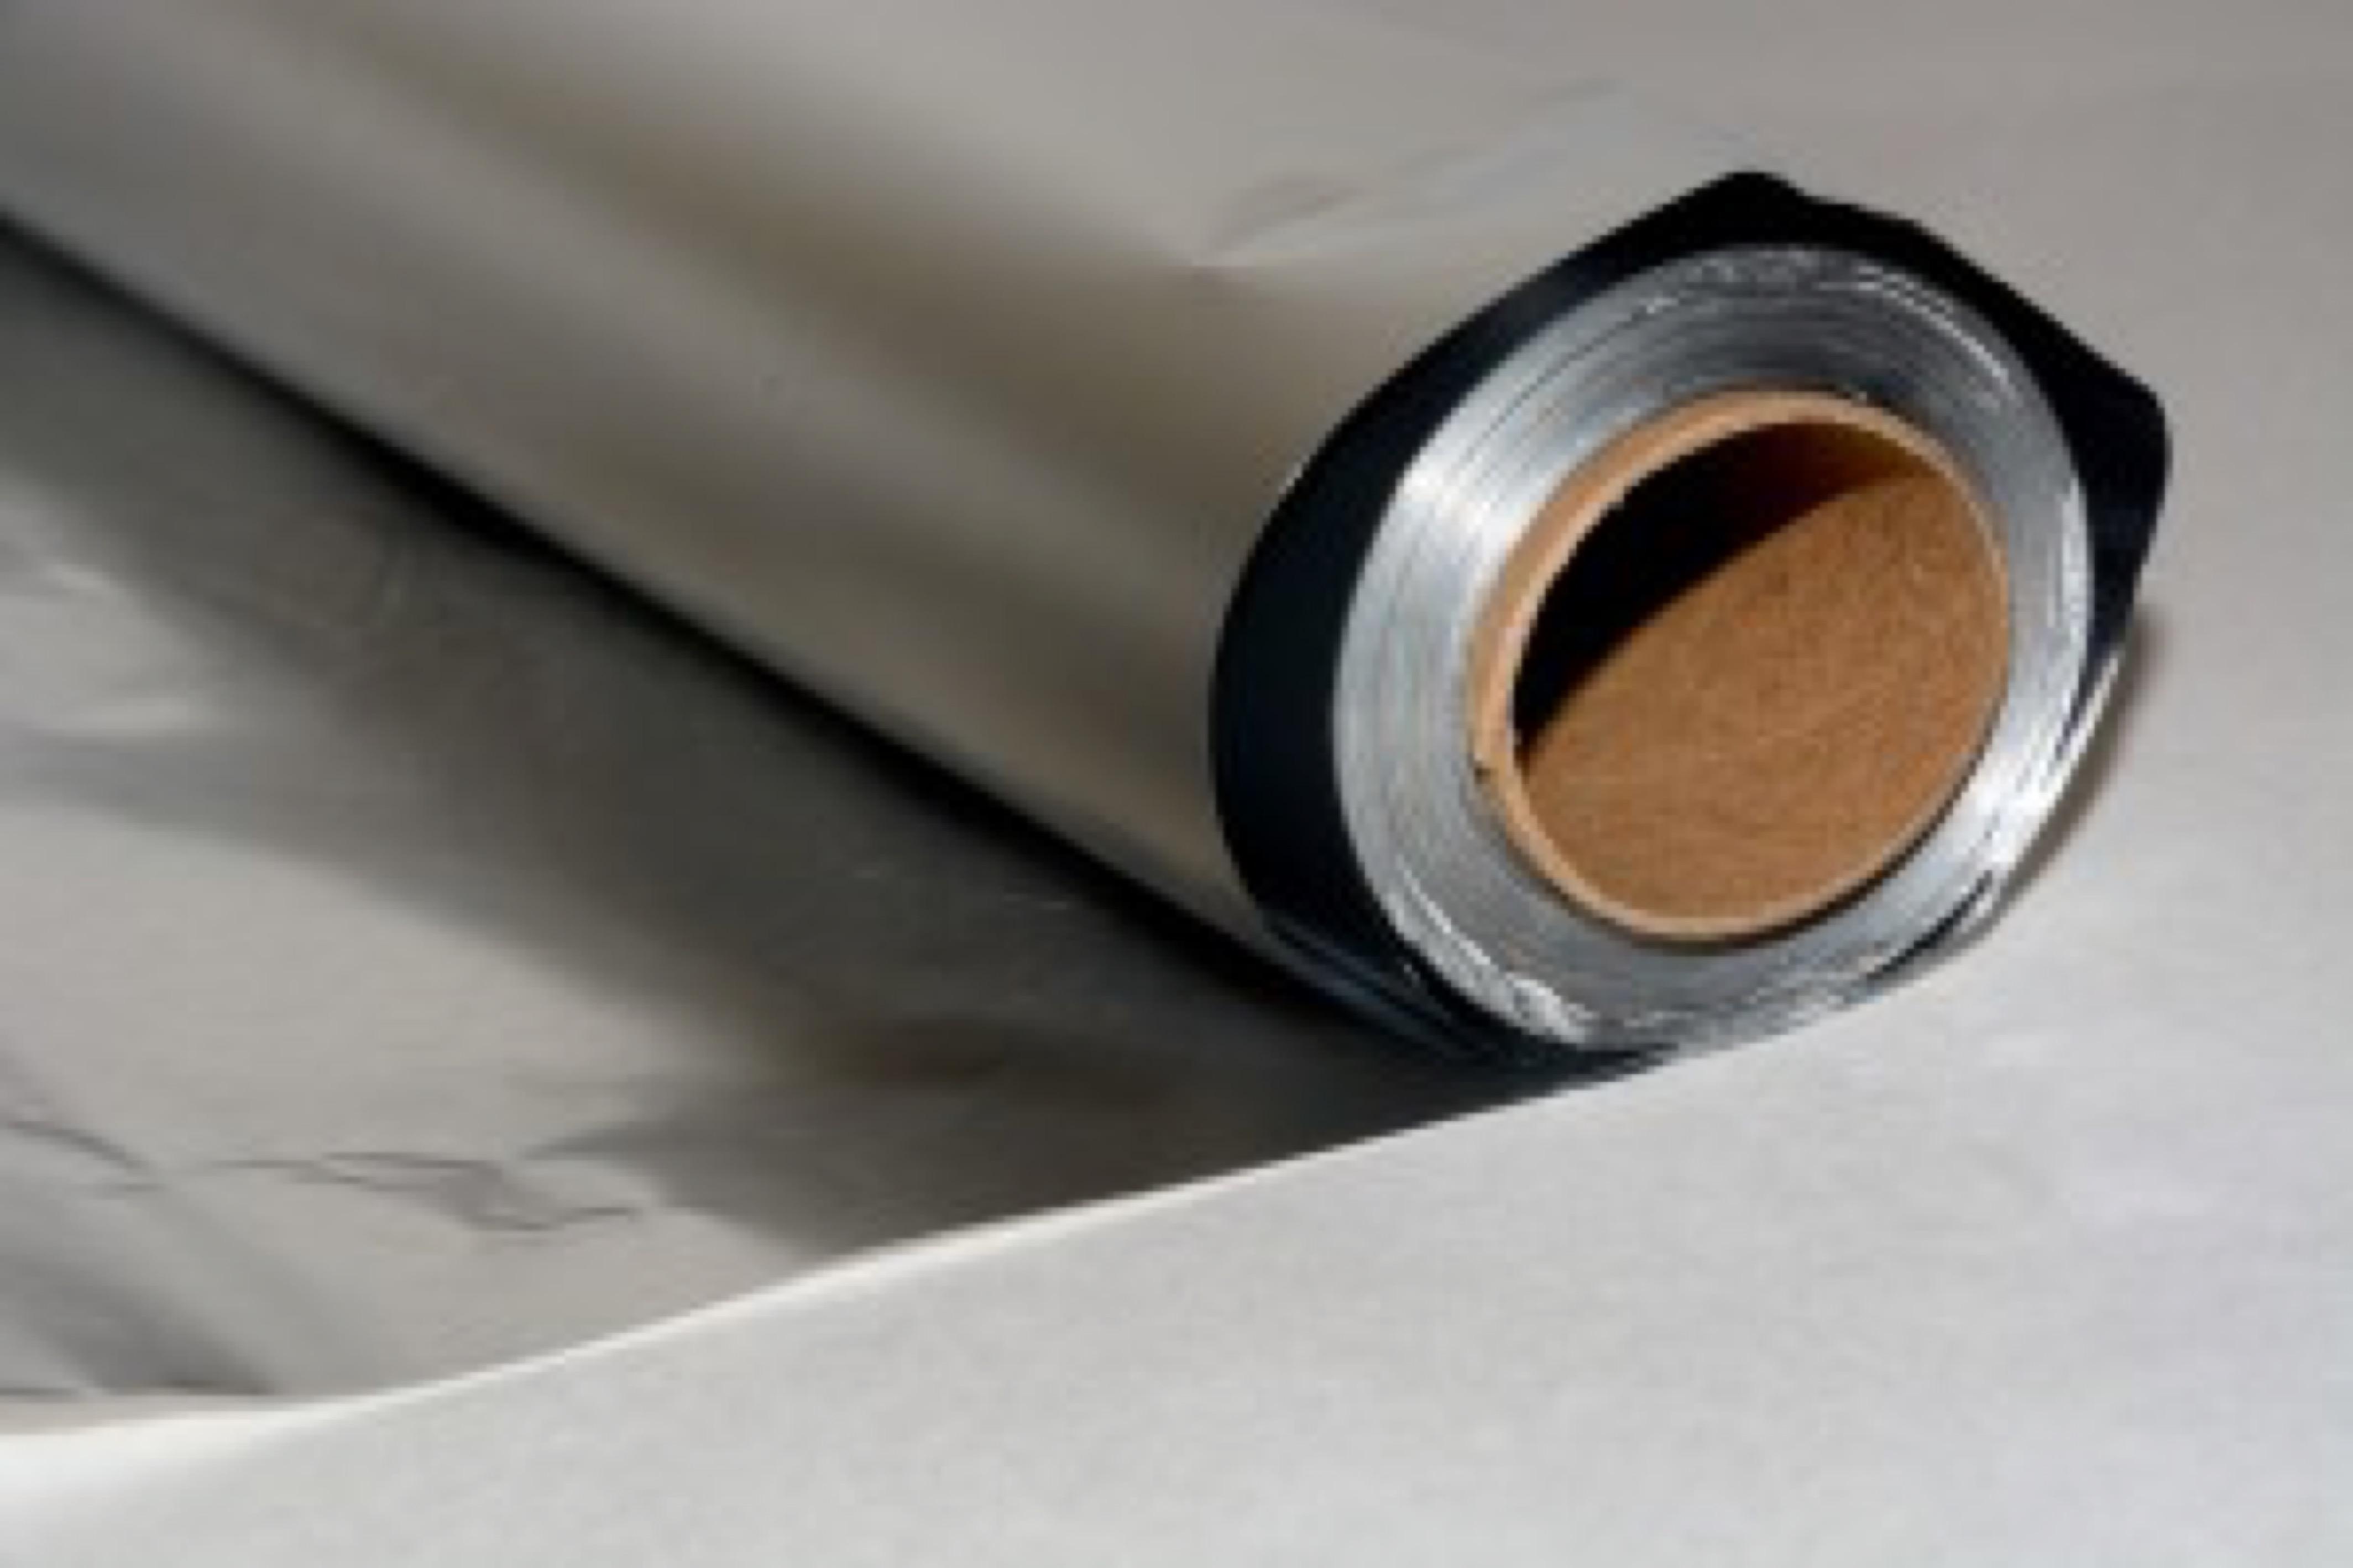 Roll of aluminum foil on white background